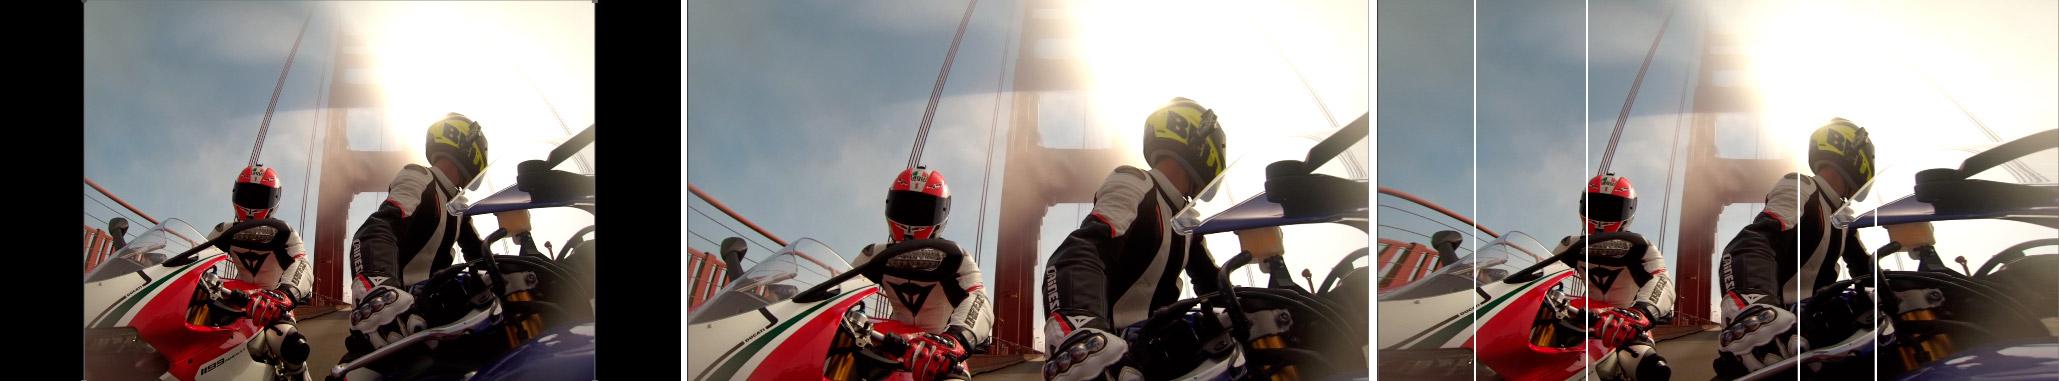 roadbike_3s